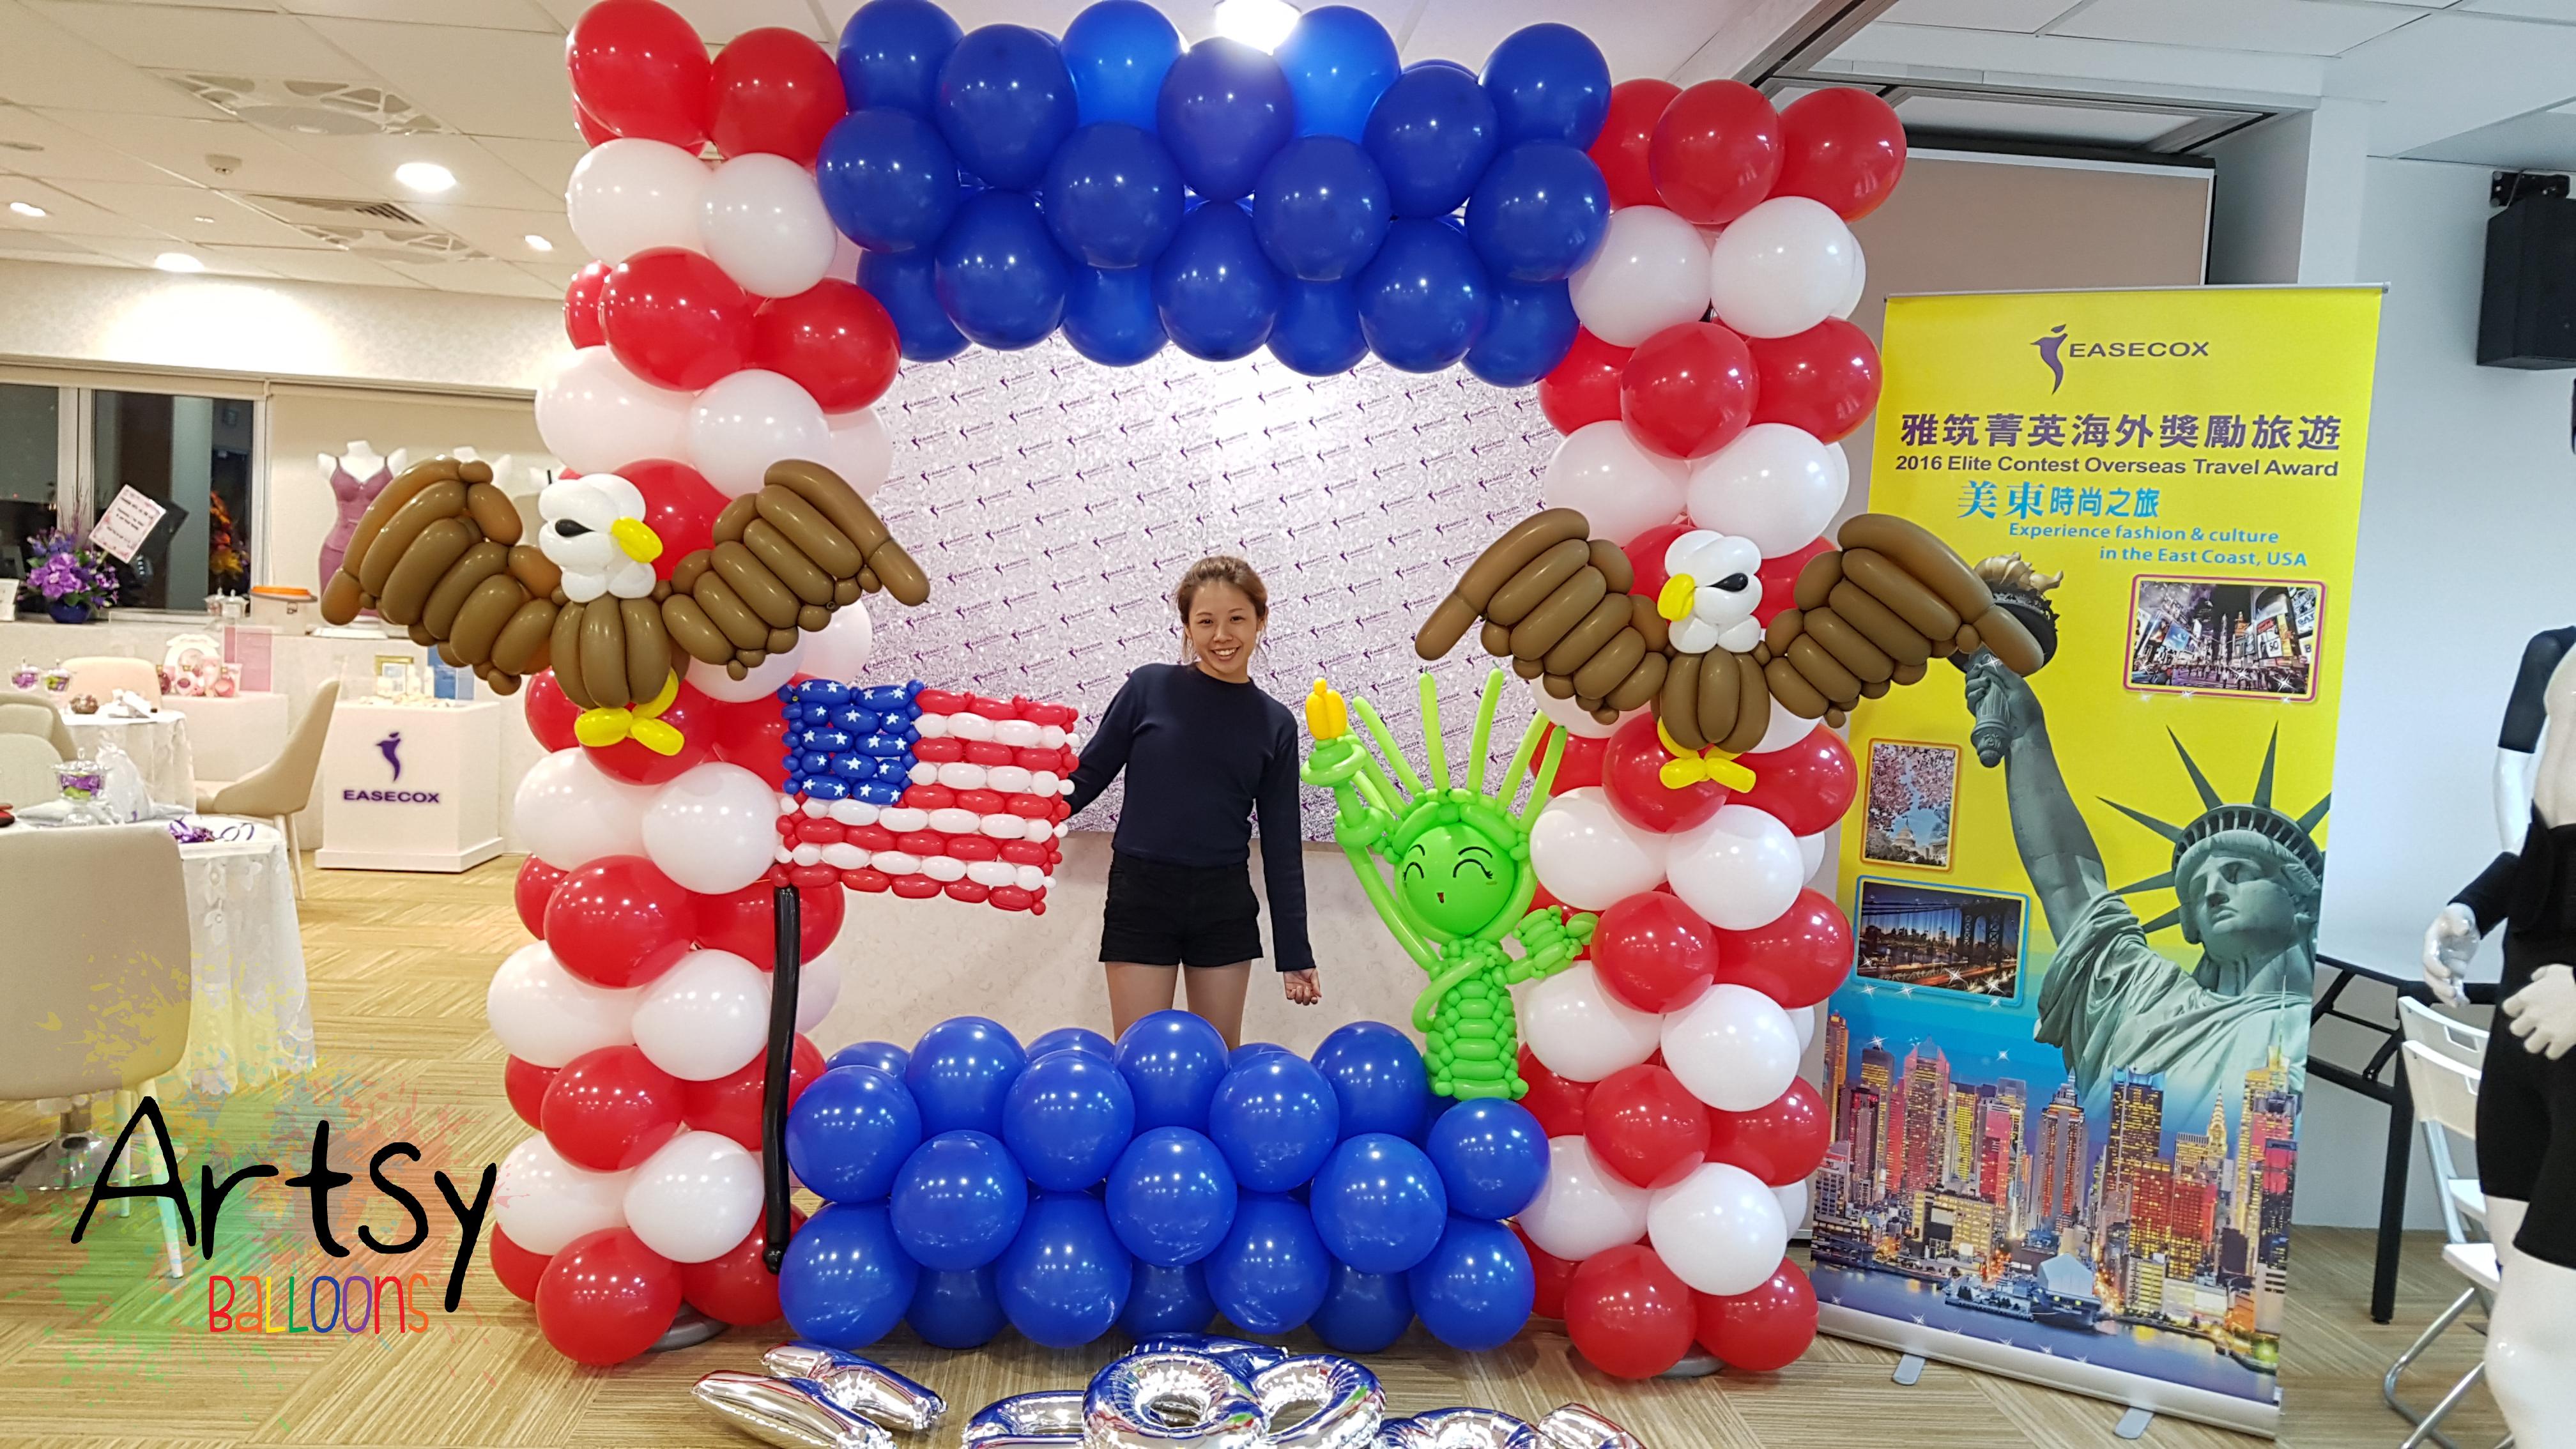 Balloon decoration artsyballoons singapore balloon for American party decoration